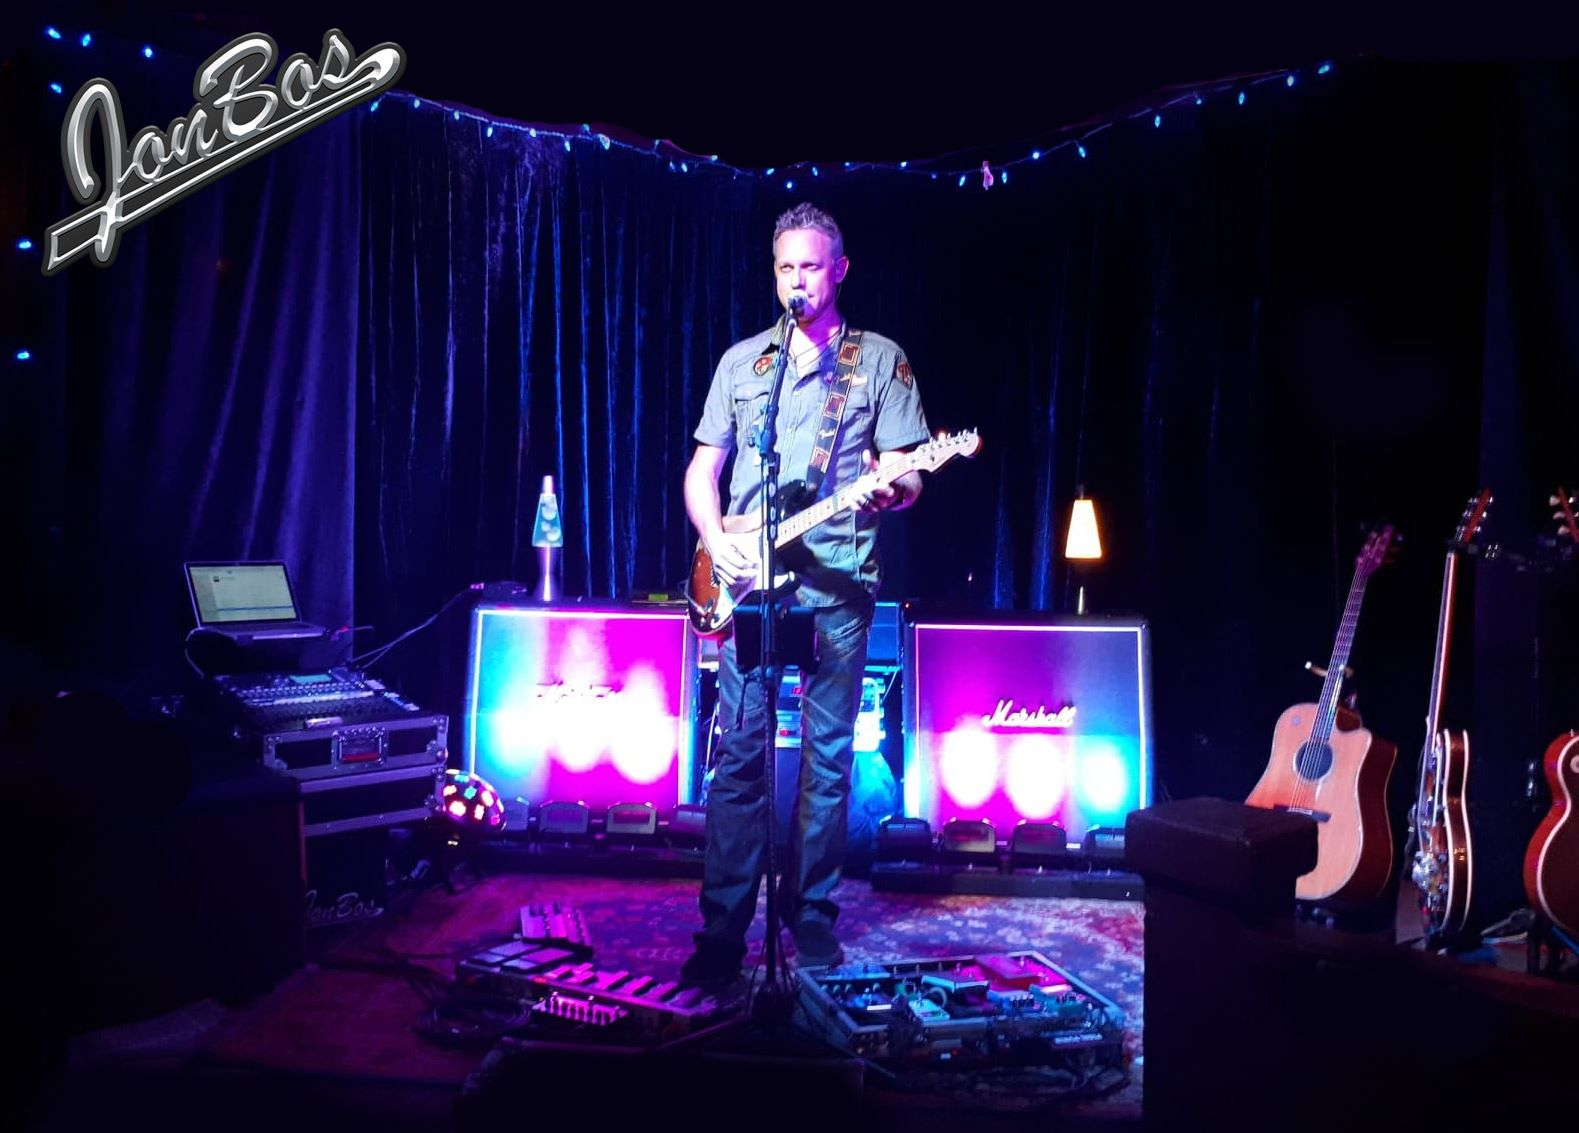 Jon Bos - Sam's Solo Show